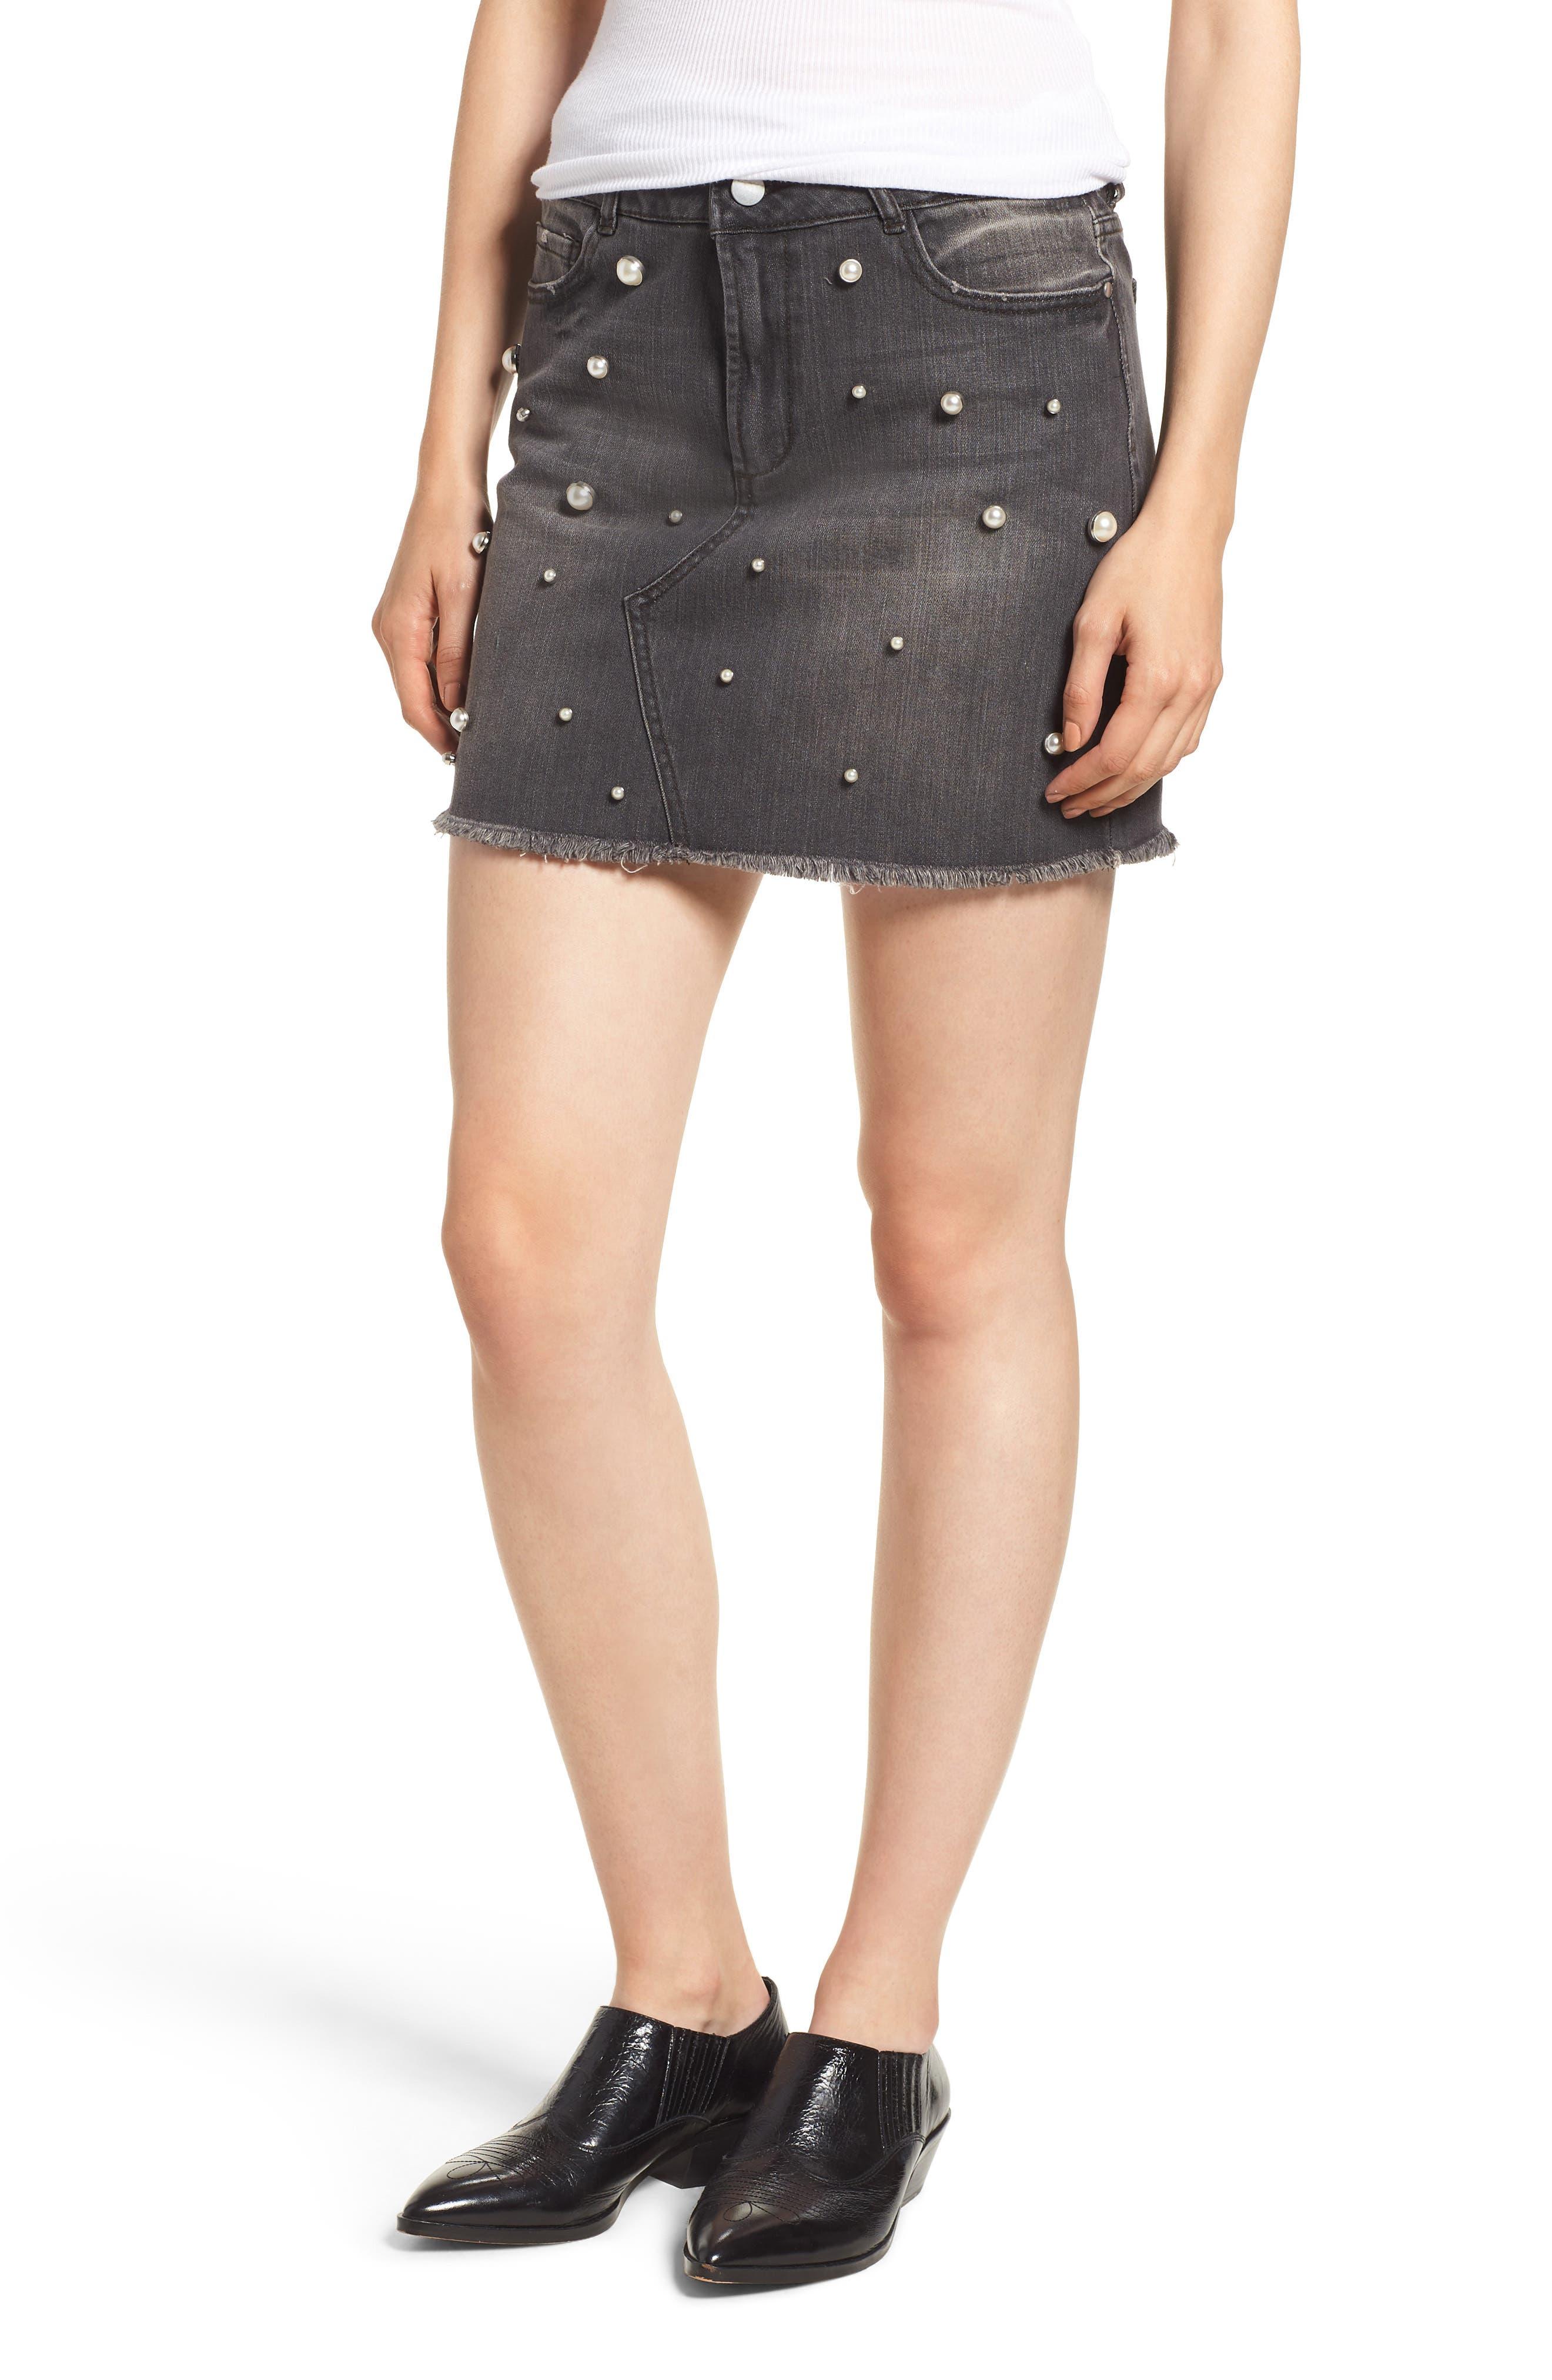 Tinsel Imitation Pearl Embellished Denim Skirt, Black